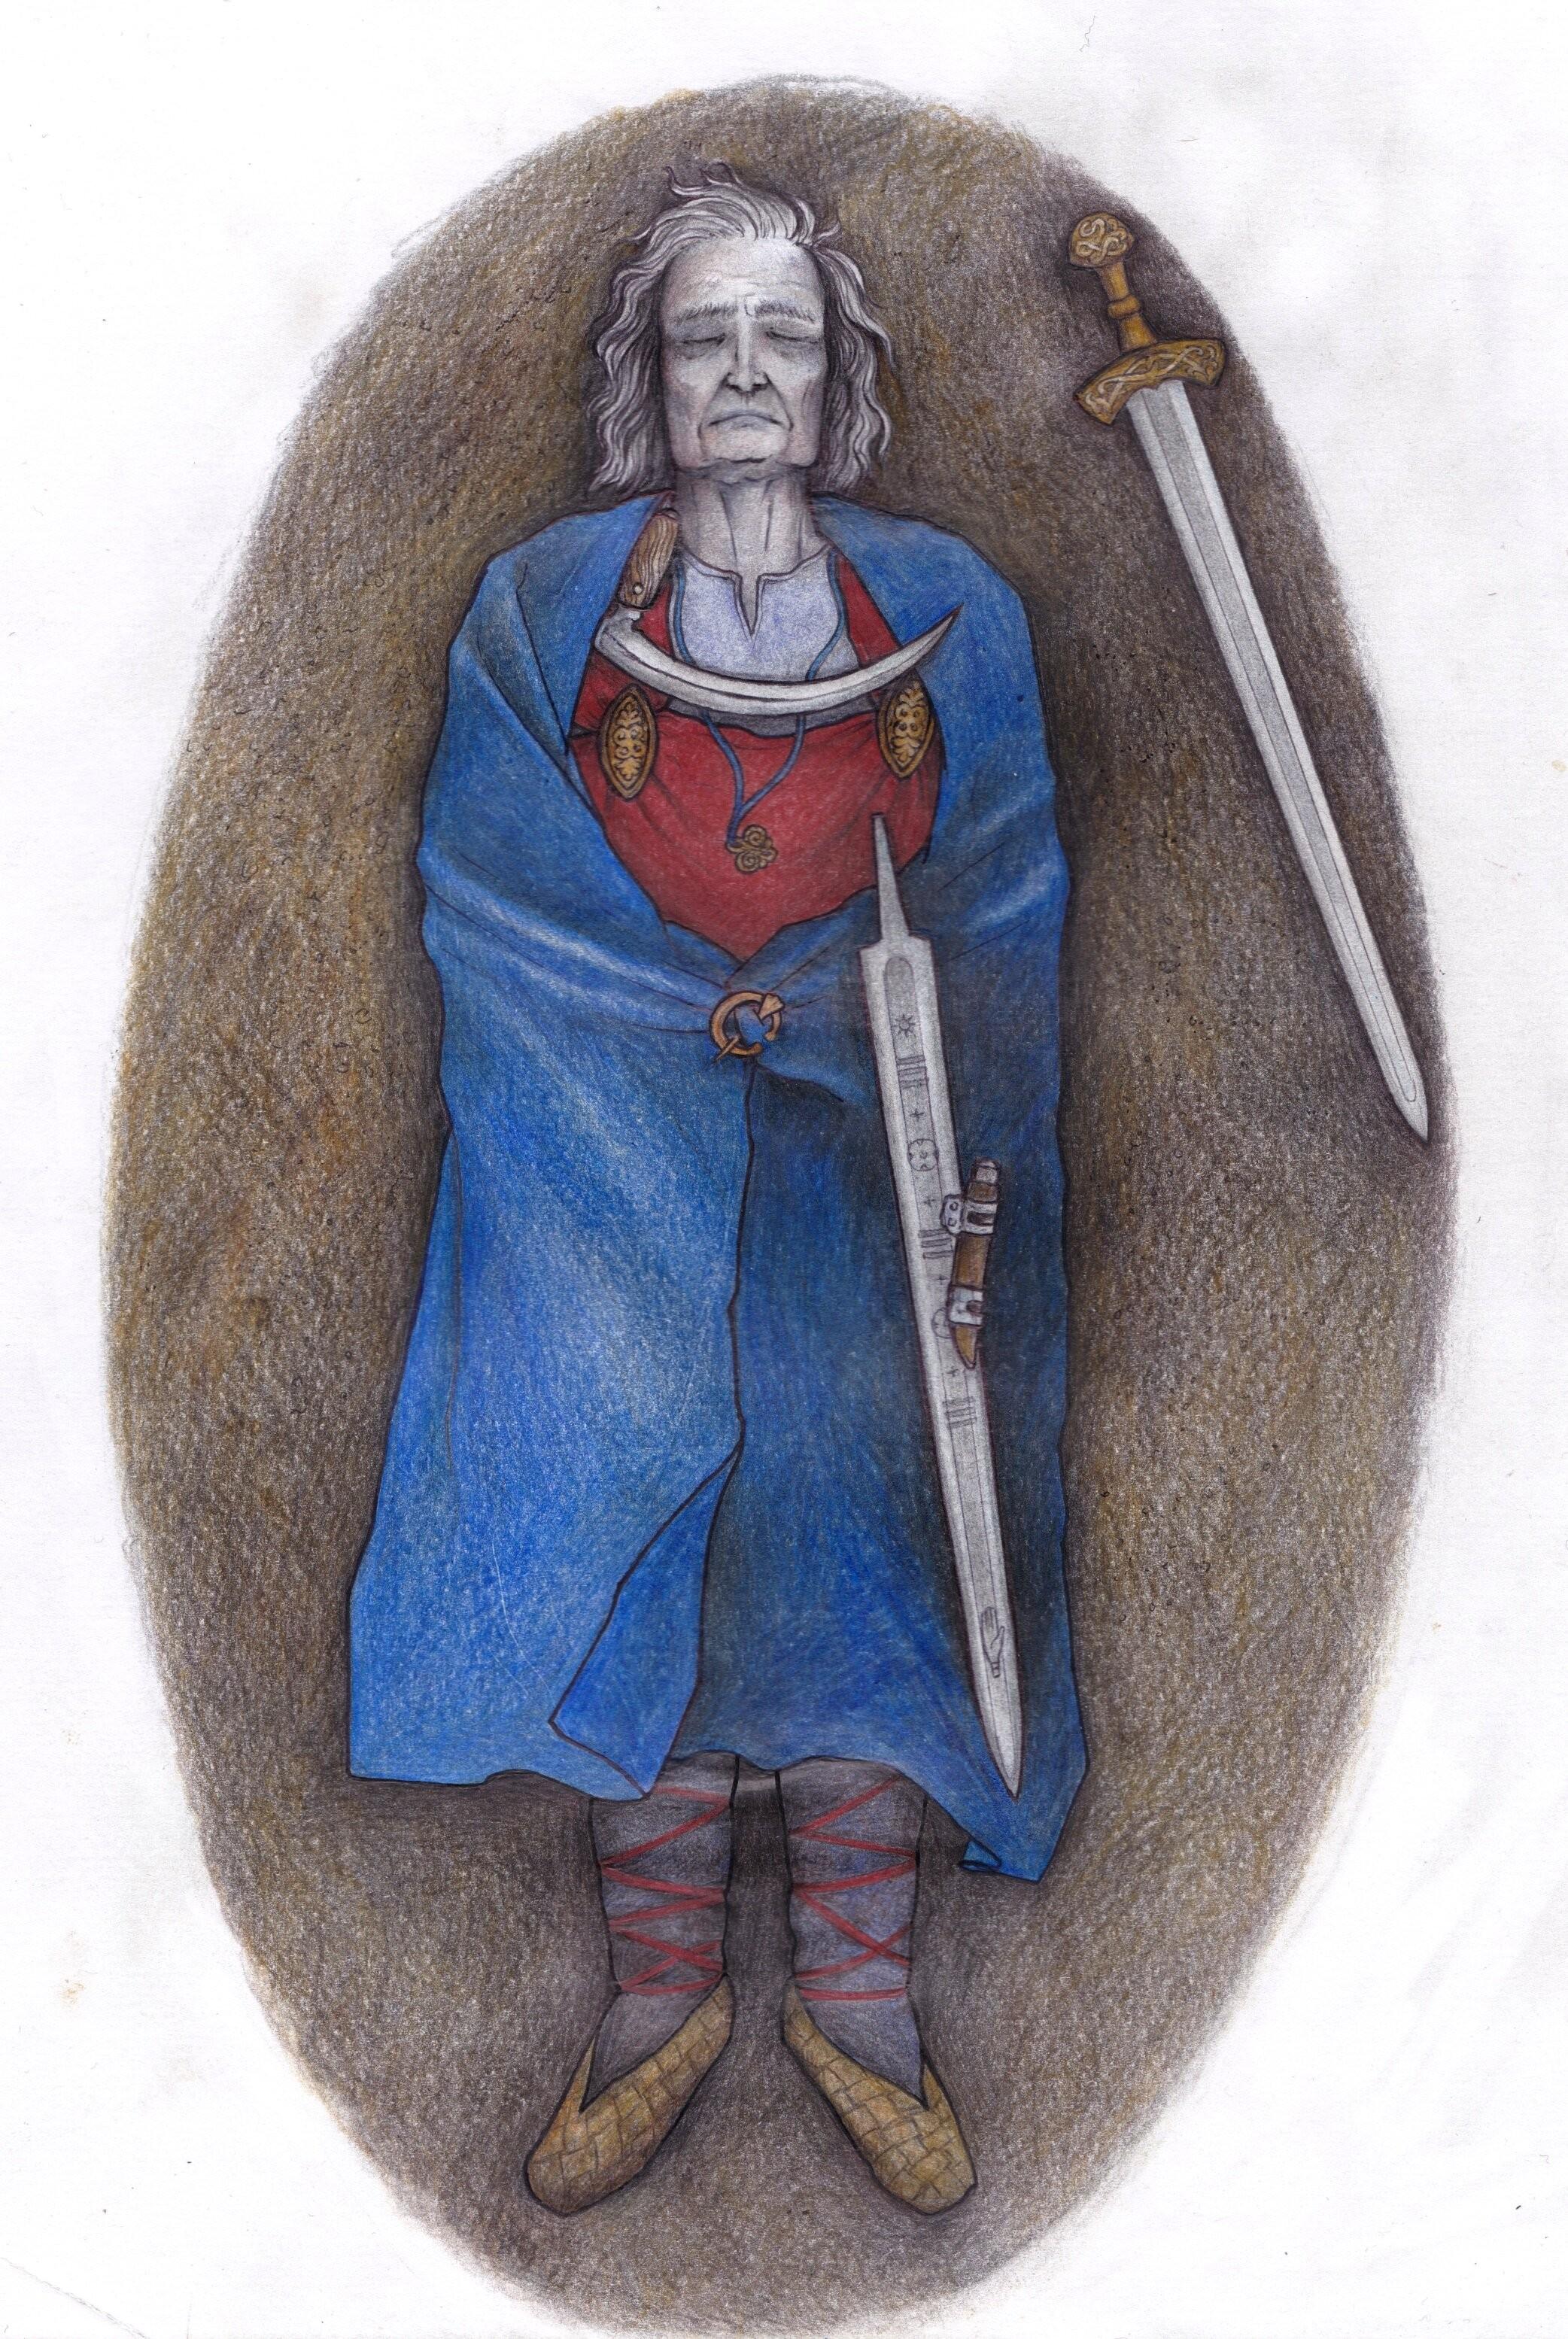 Desenho reconstrói o túmulo de Suontaka, na Finlândia (Foto: Veronika Paschenko)